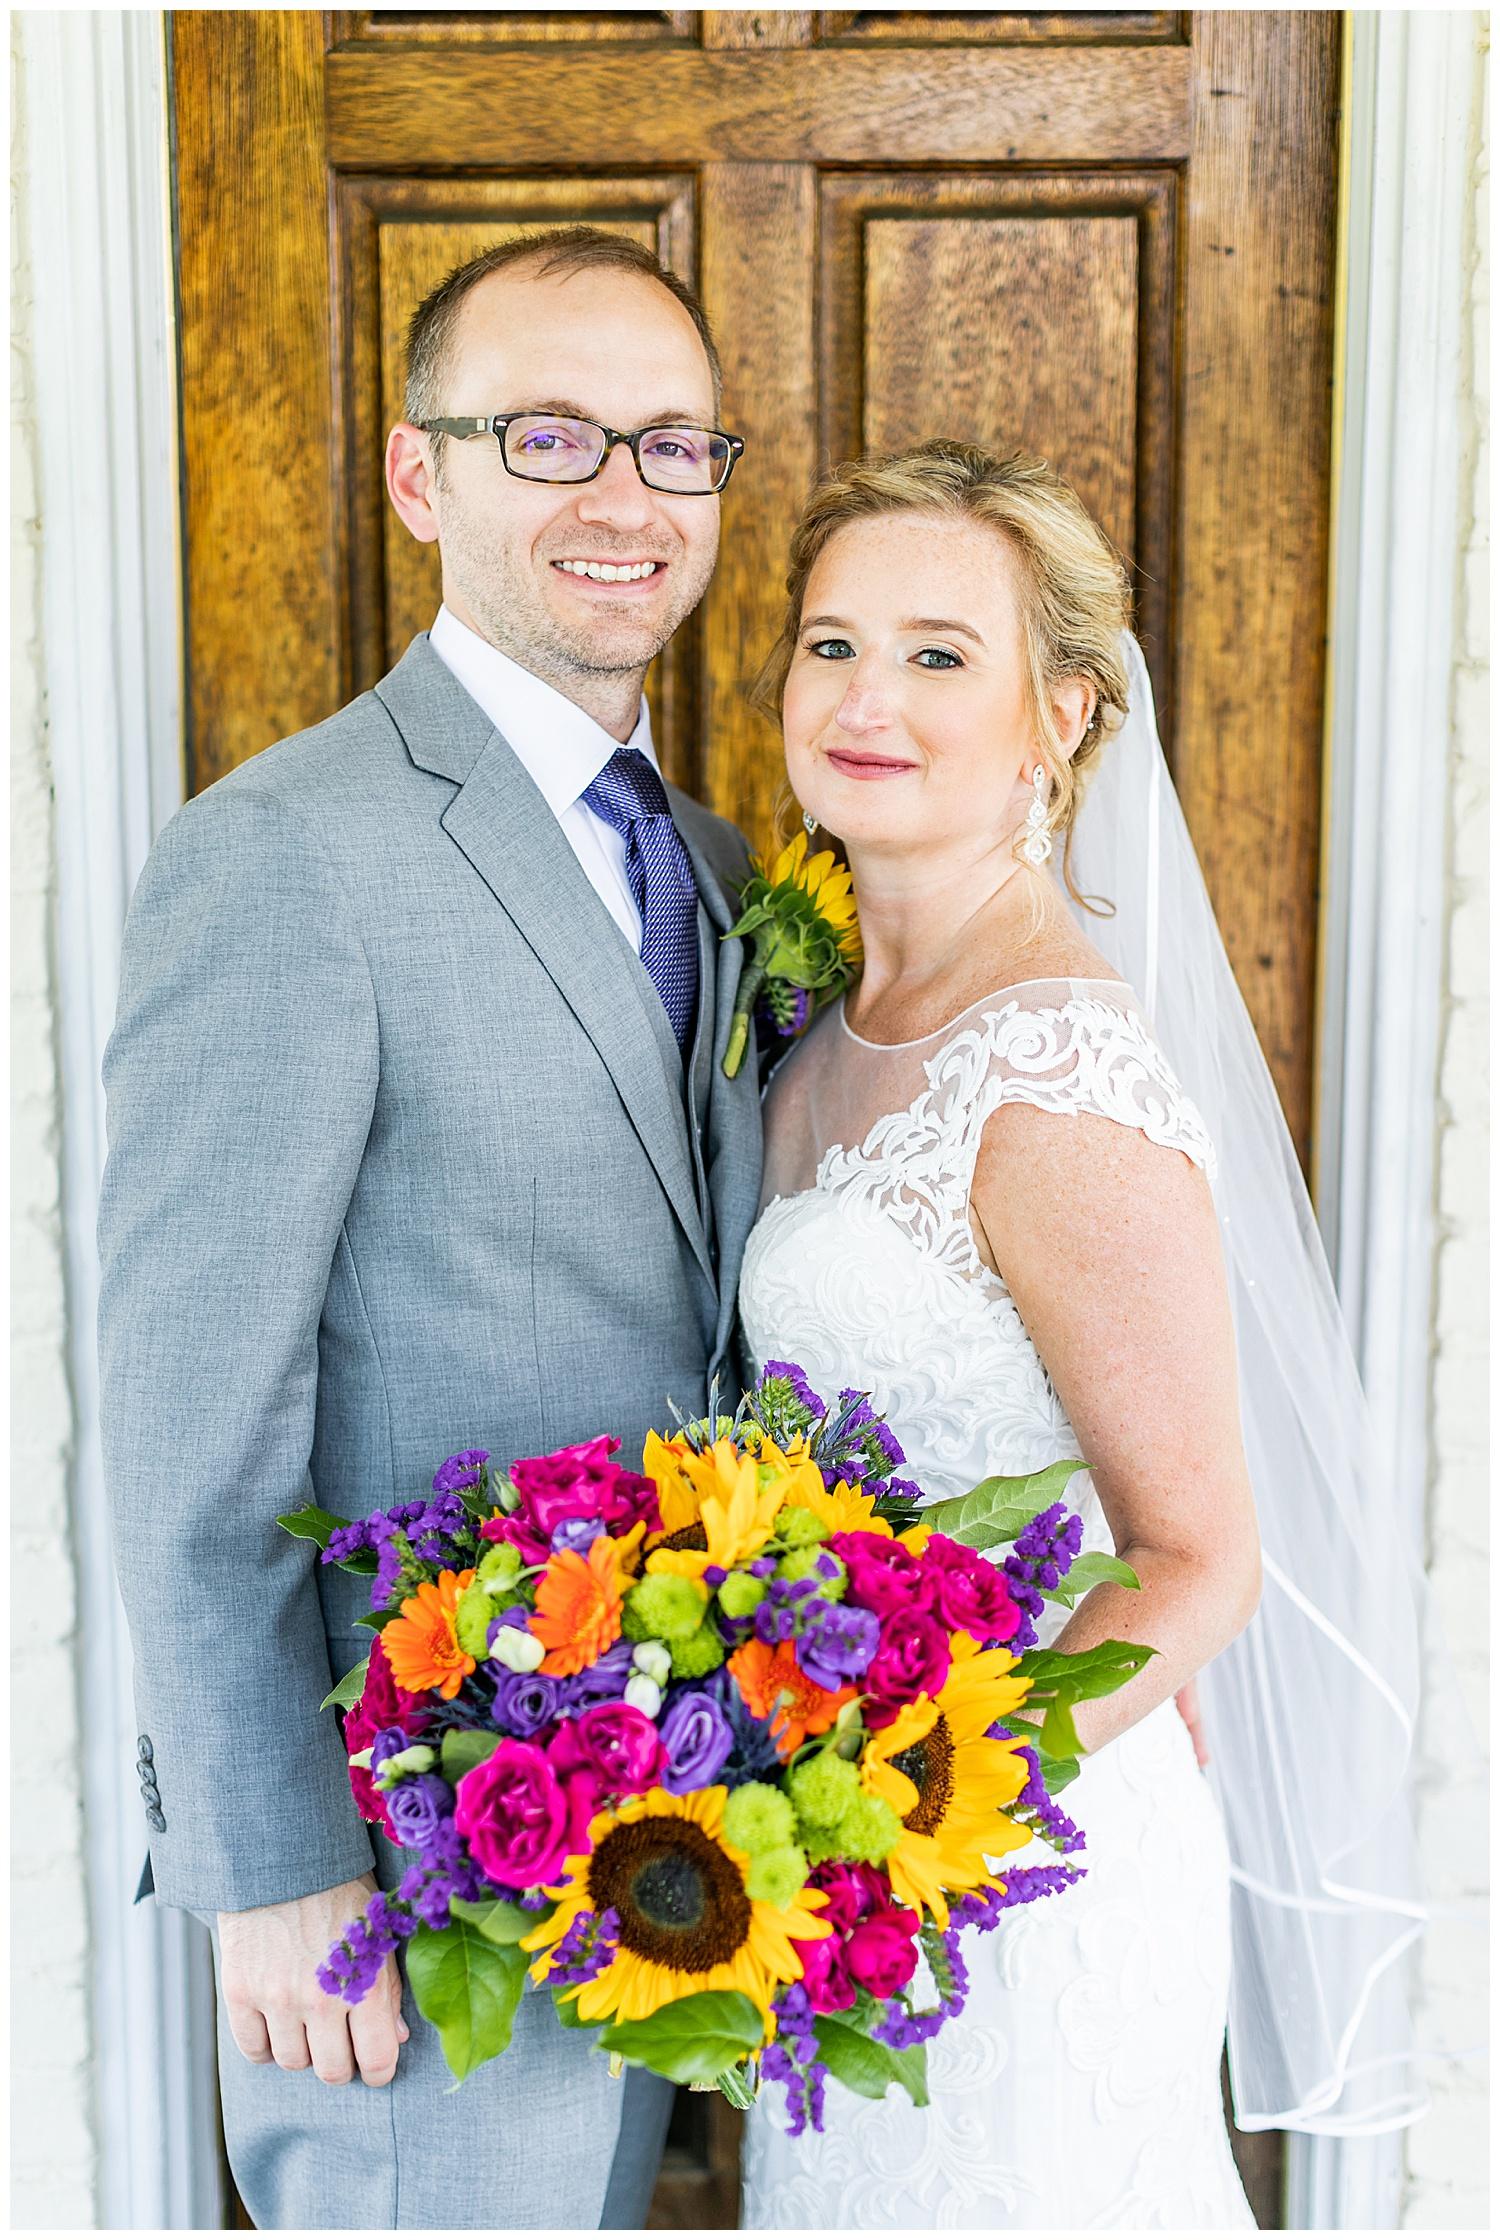 Michelle Shaun Antrim 1844 Wedding Living Radiant Photography photos_0054.jpg